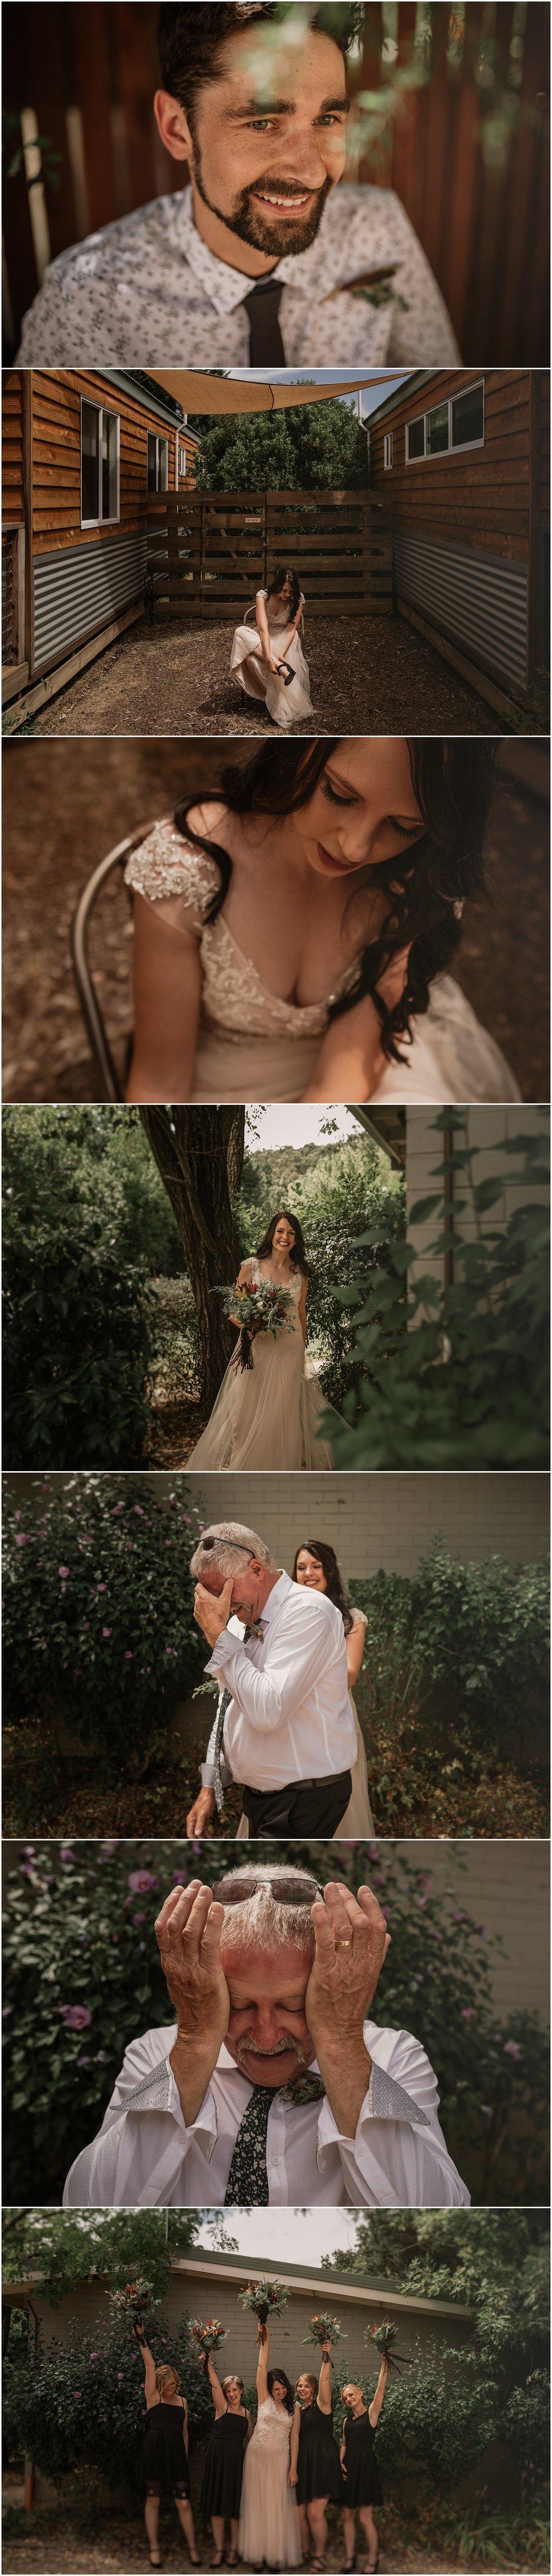 Pablo Laguia wedding Australia  0054.jpg